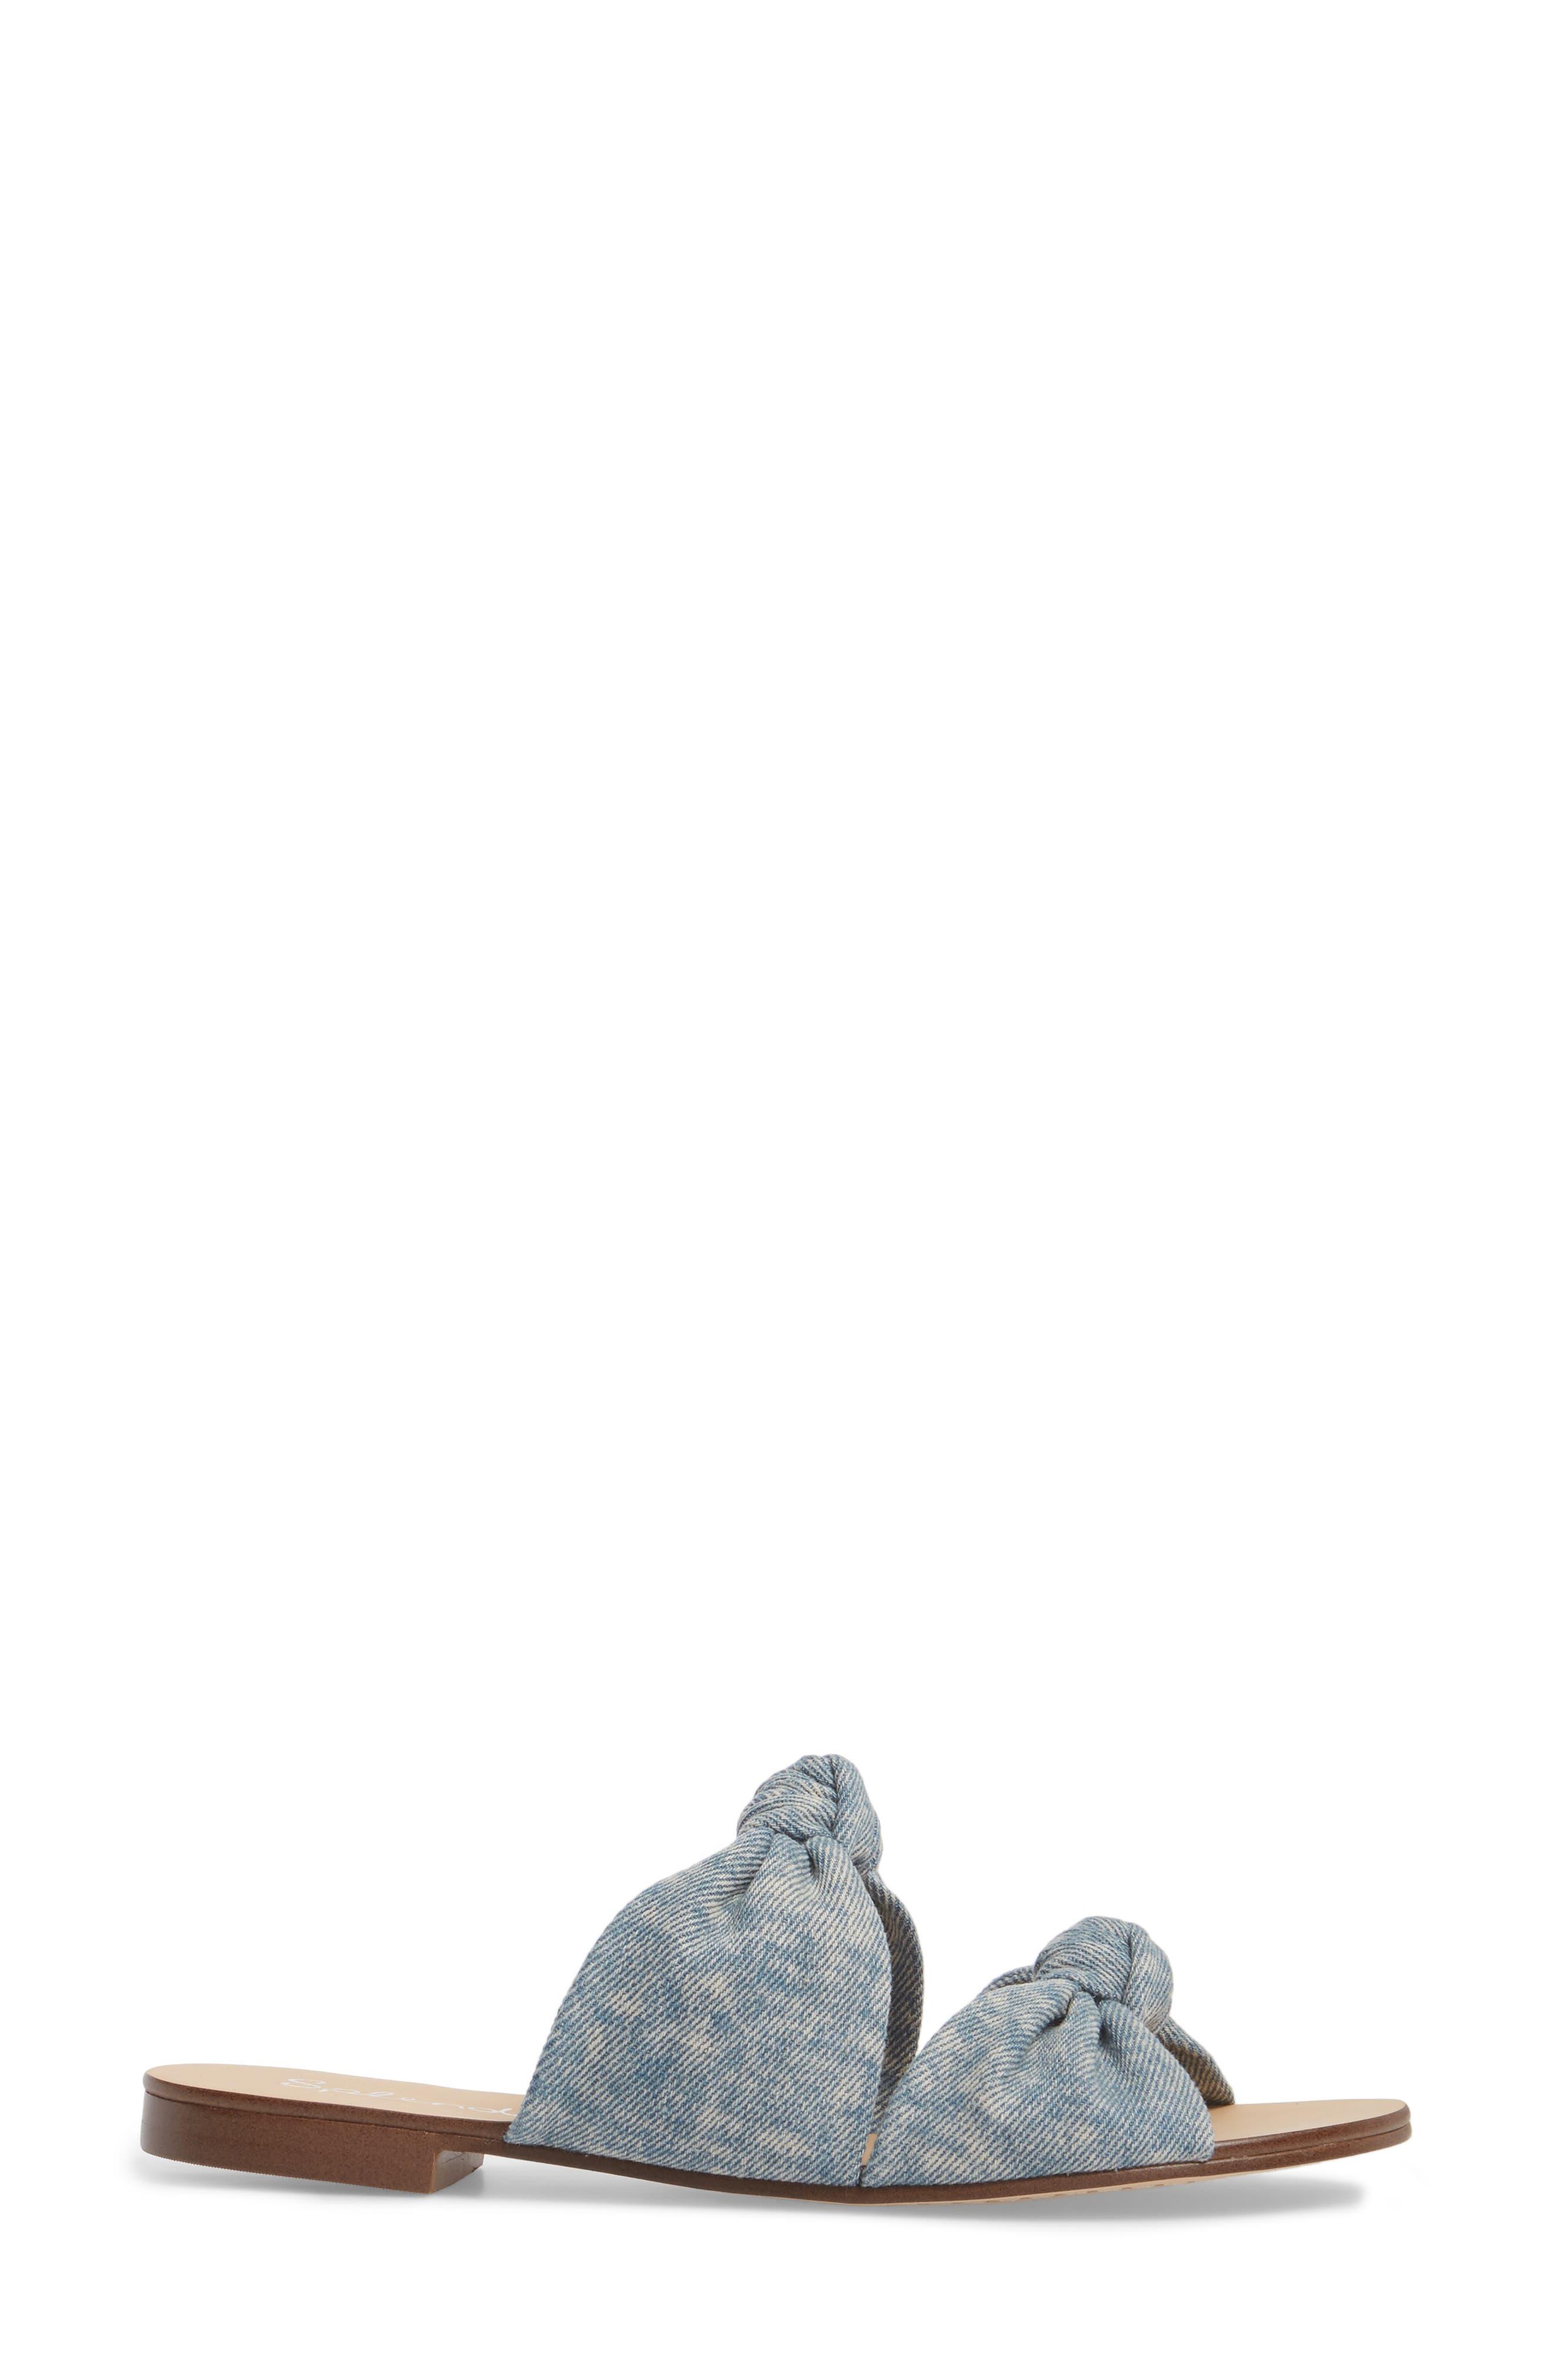 Barton Double Knotted Slide Sandal,                             Alternate thumbnail 3, color,                             Jean Fabric